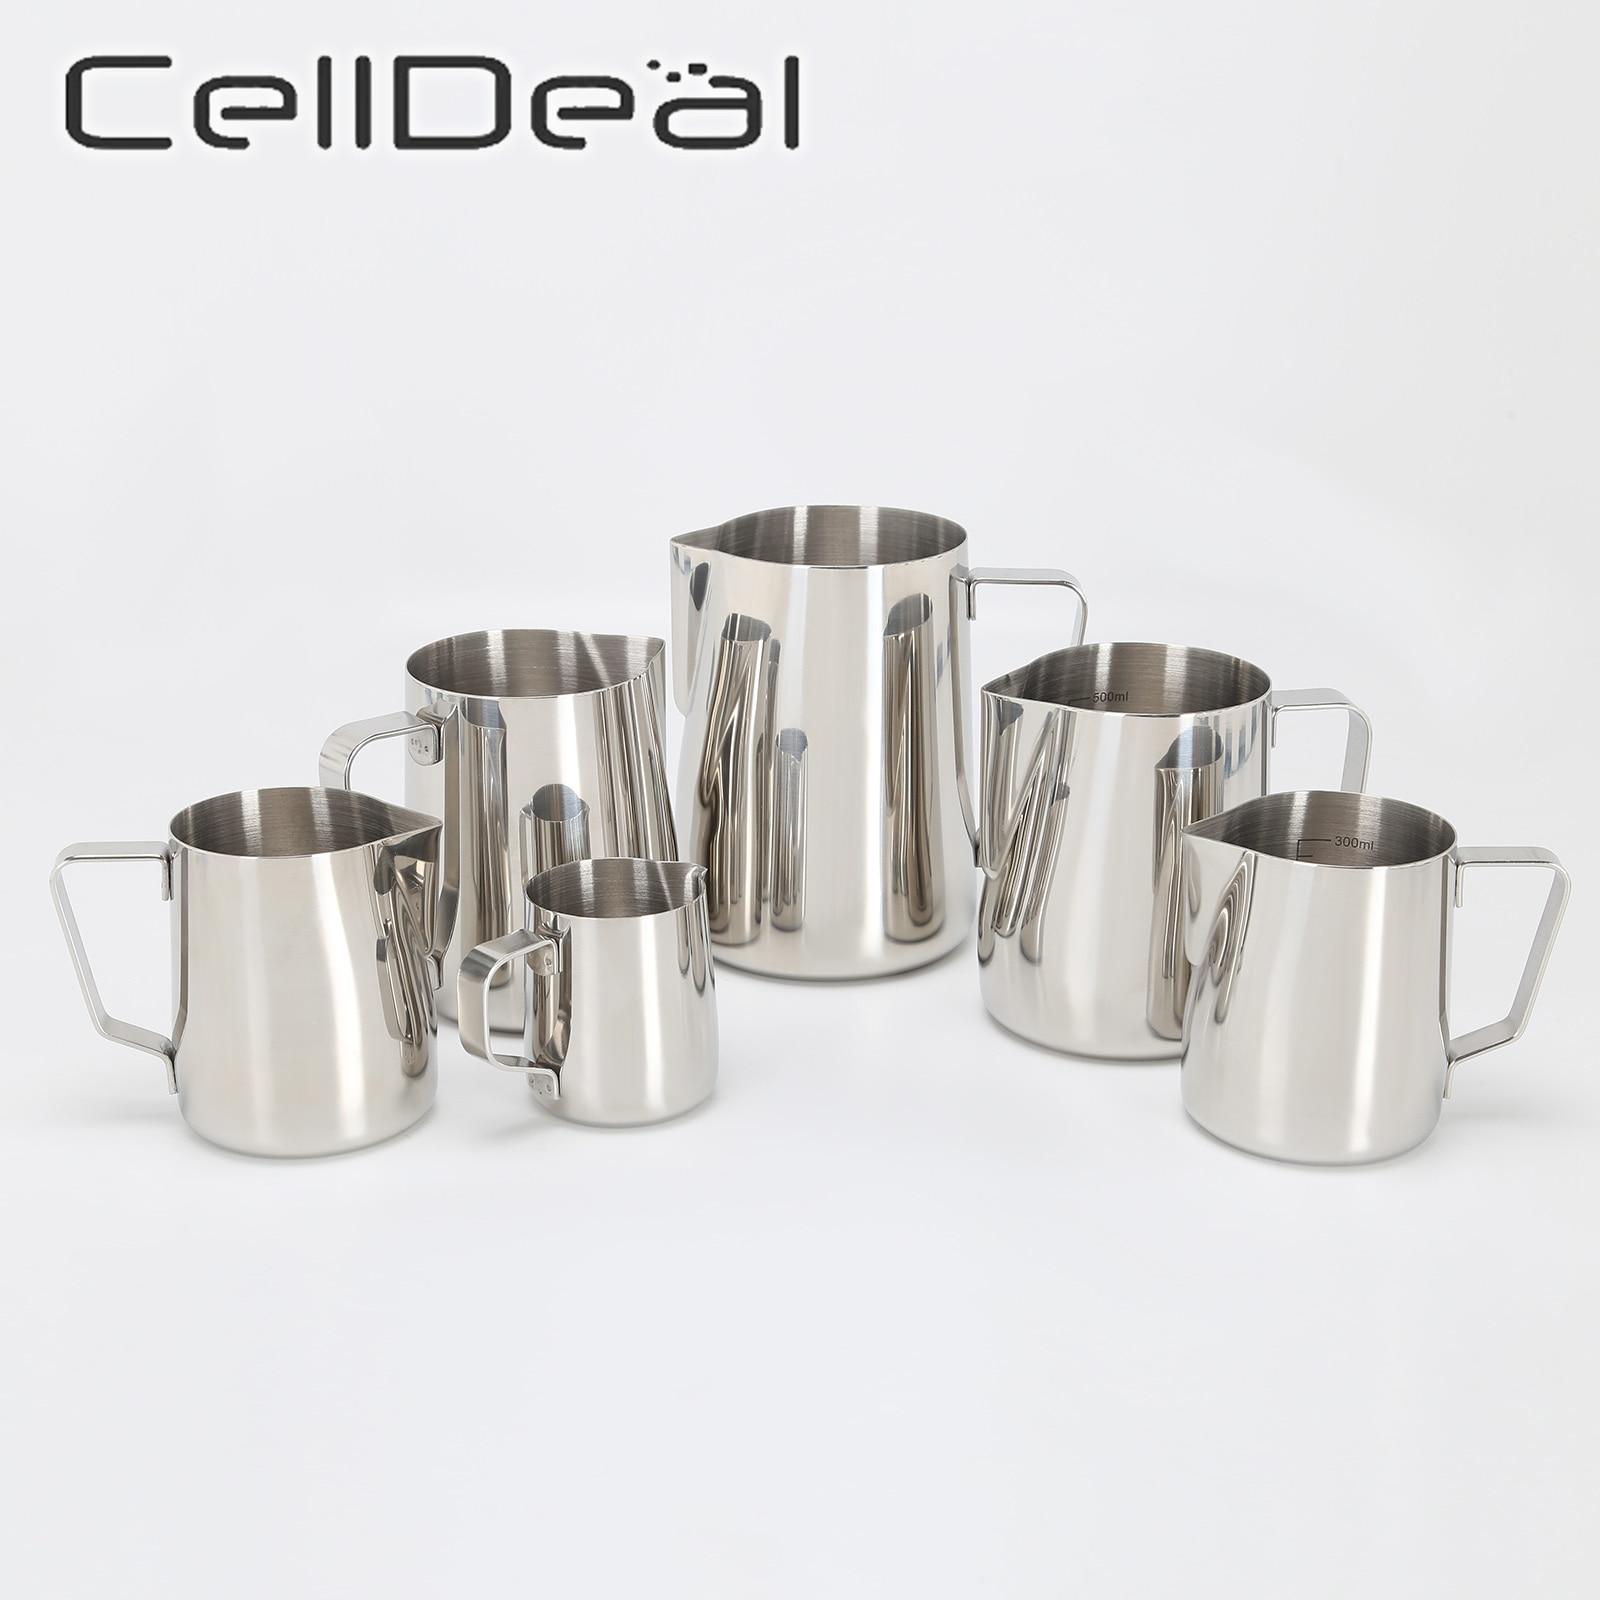 CellDeal paslanmaz çelik süt köpürtme sürahisi Espresso kahve Barista Latte Cappuccino süt kreması fincan Frothing sürahi sürahi